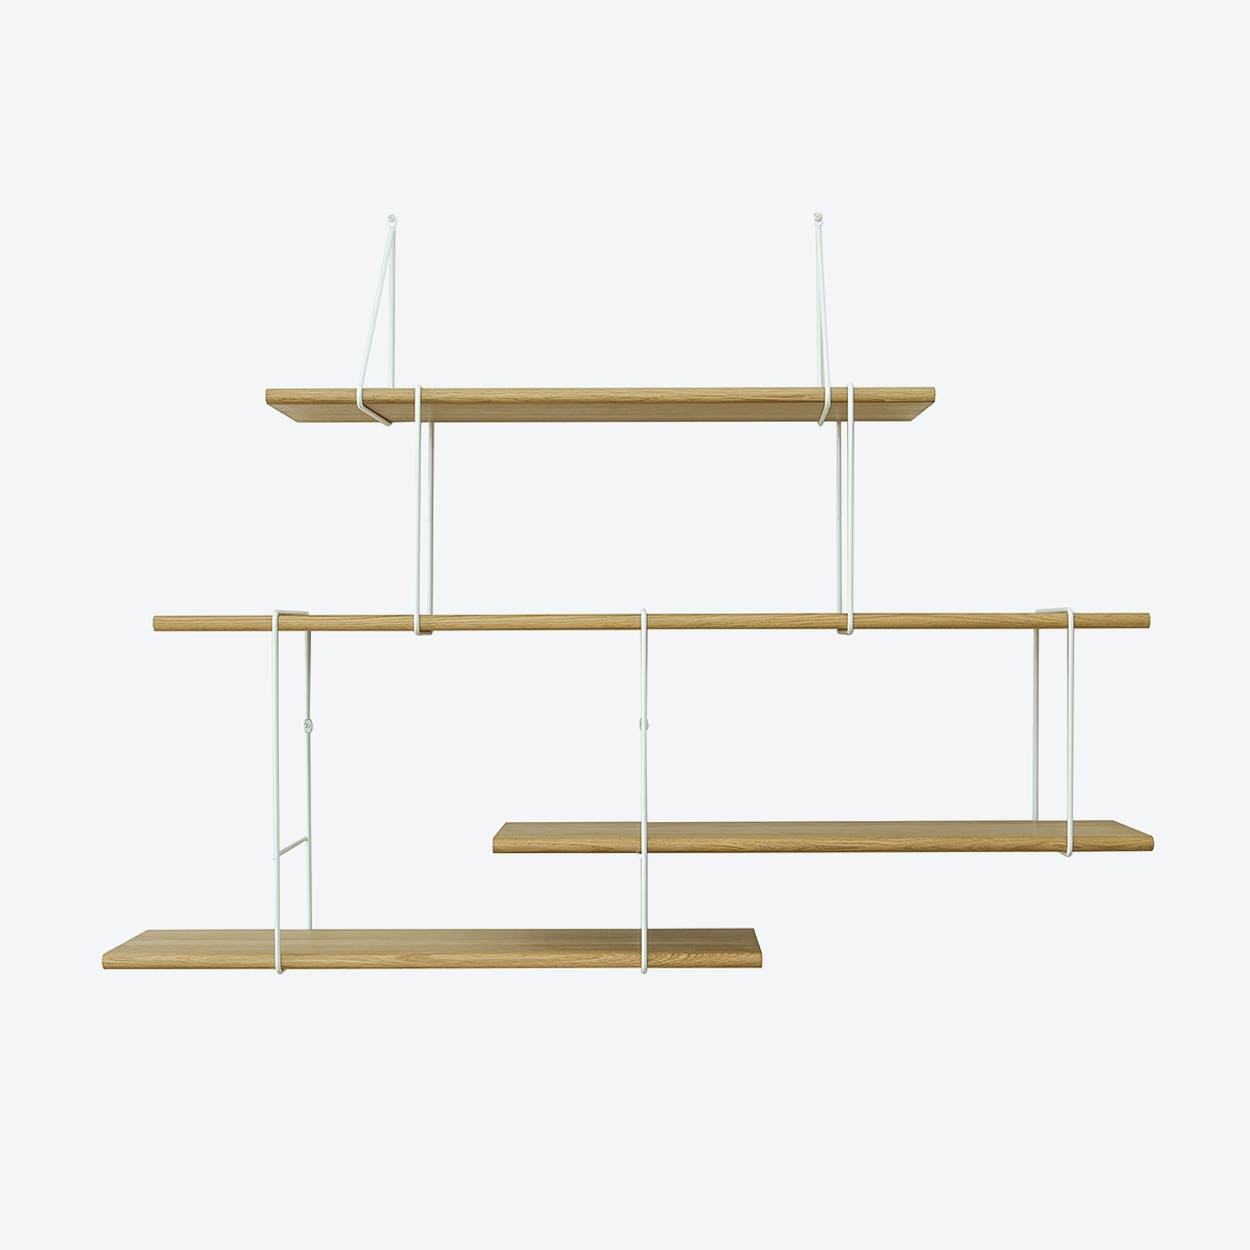 LINK Shelf, Setup 2, in Oak/White